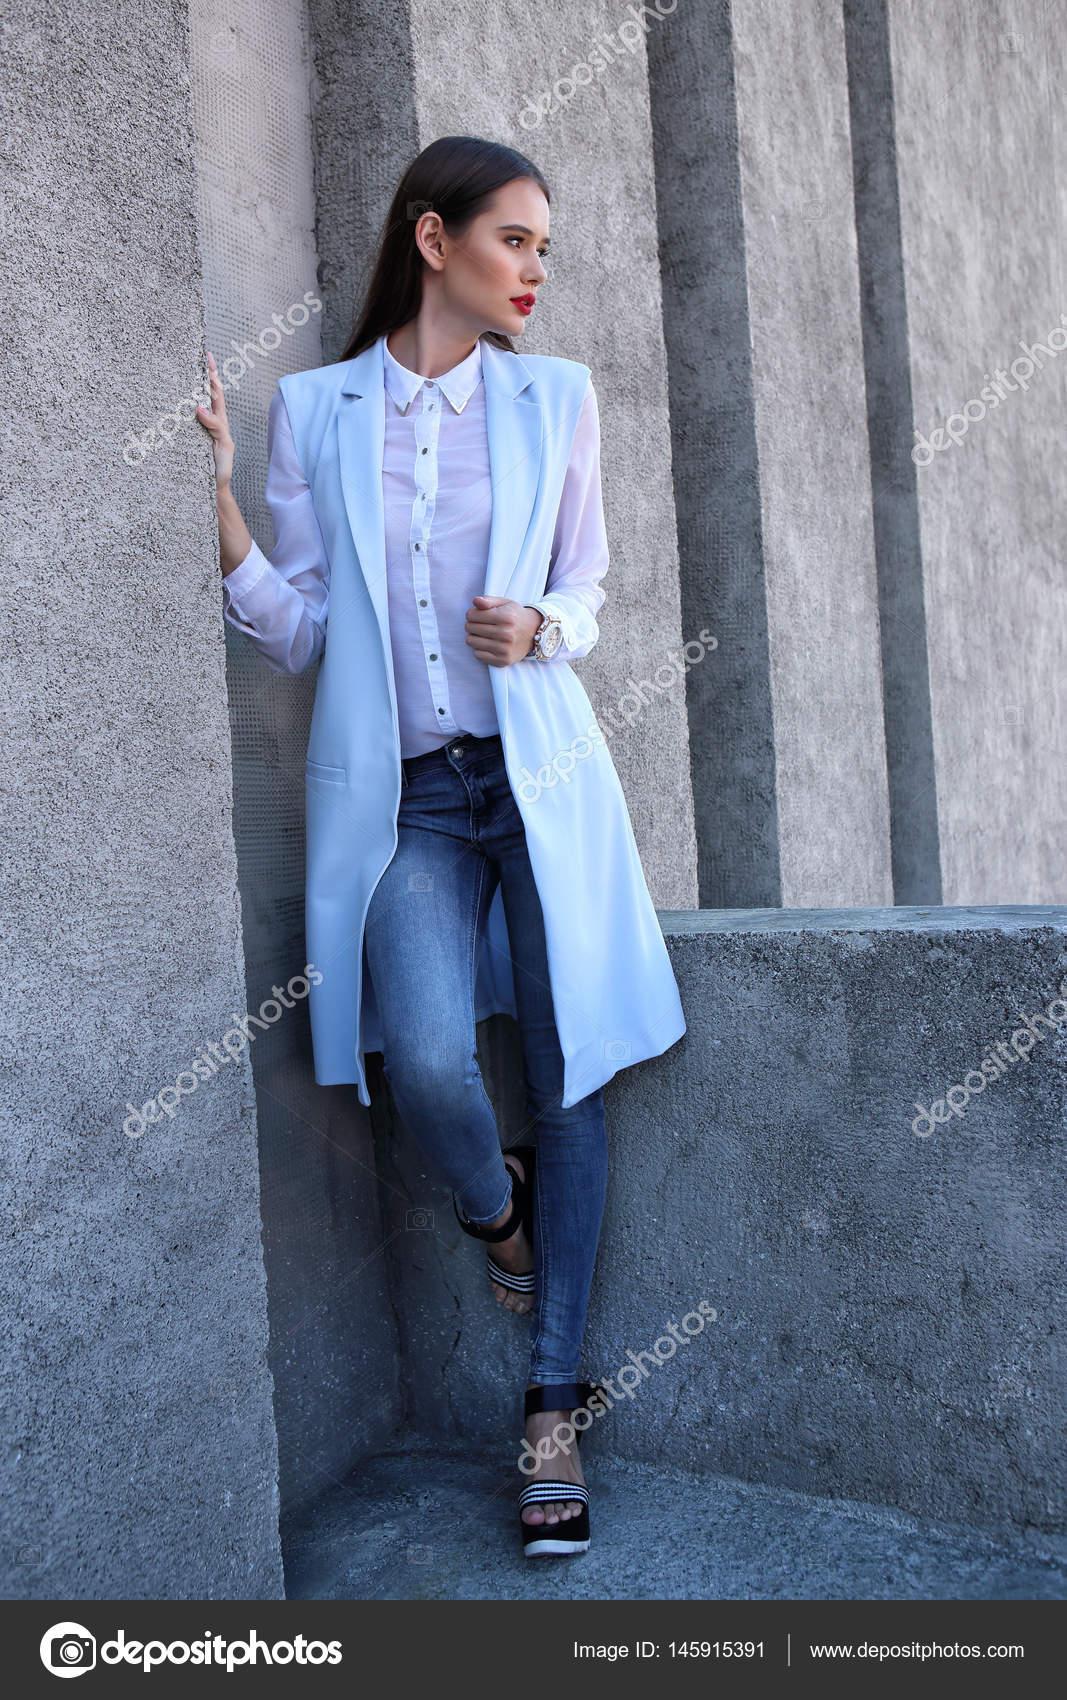 c18ad4d4a3e283 junge Frau in blauer Jacke — Stockfoto © MaxFrost  145915391